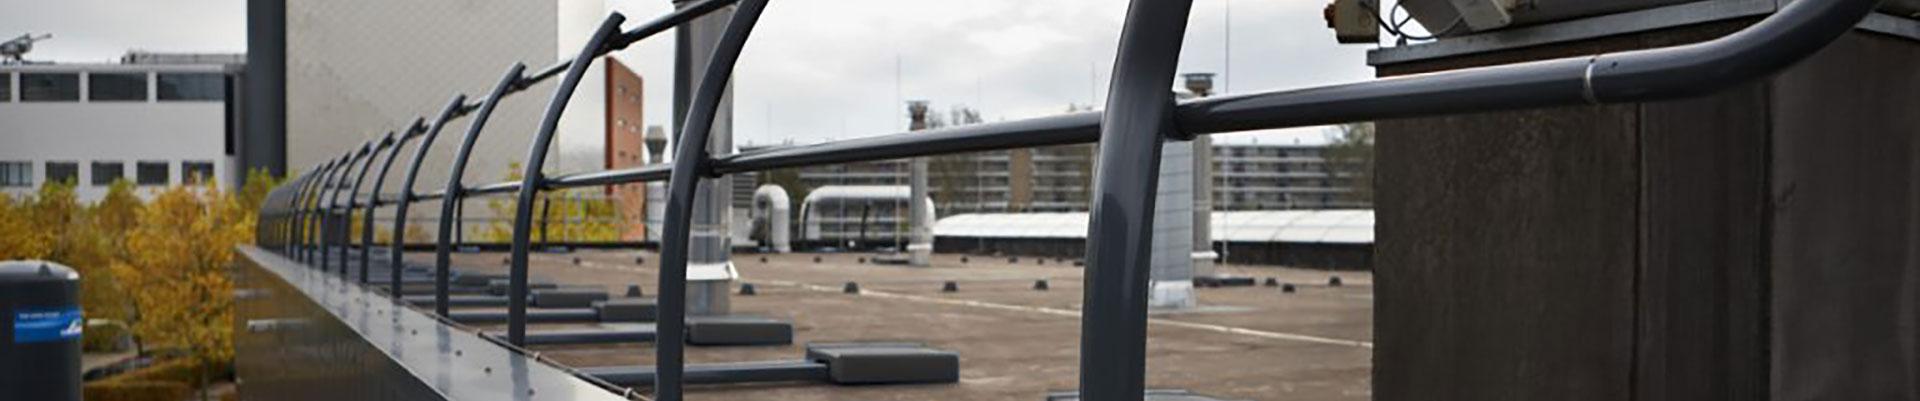 Aluminium Guardrail / Handrail Services